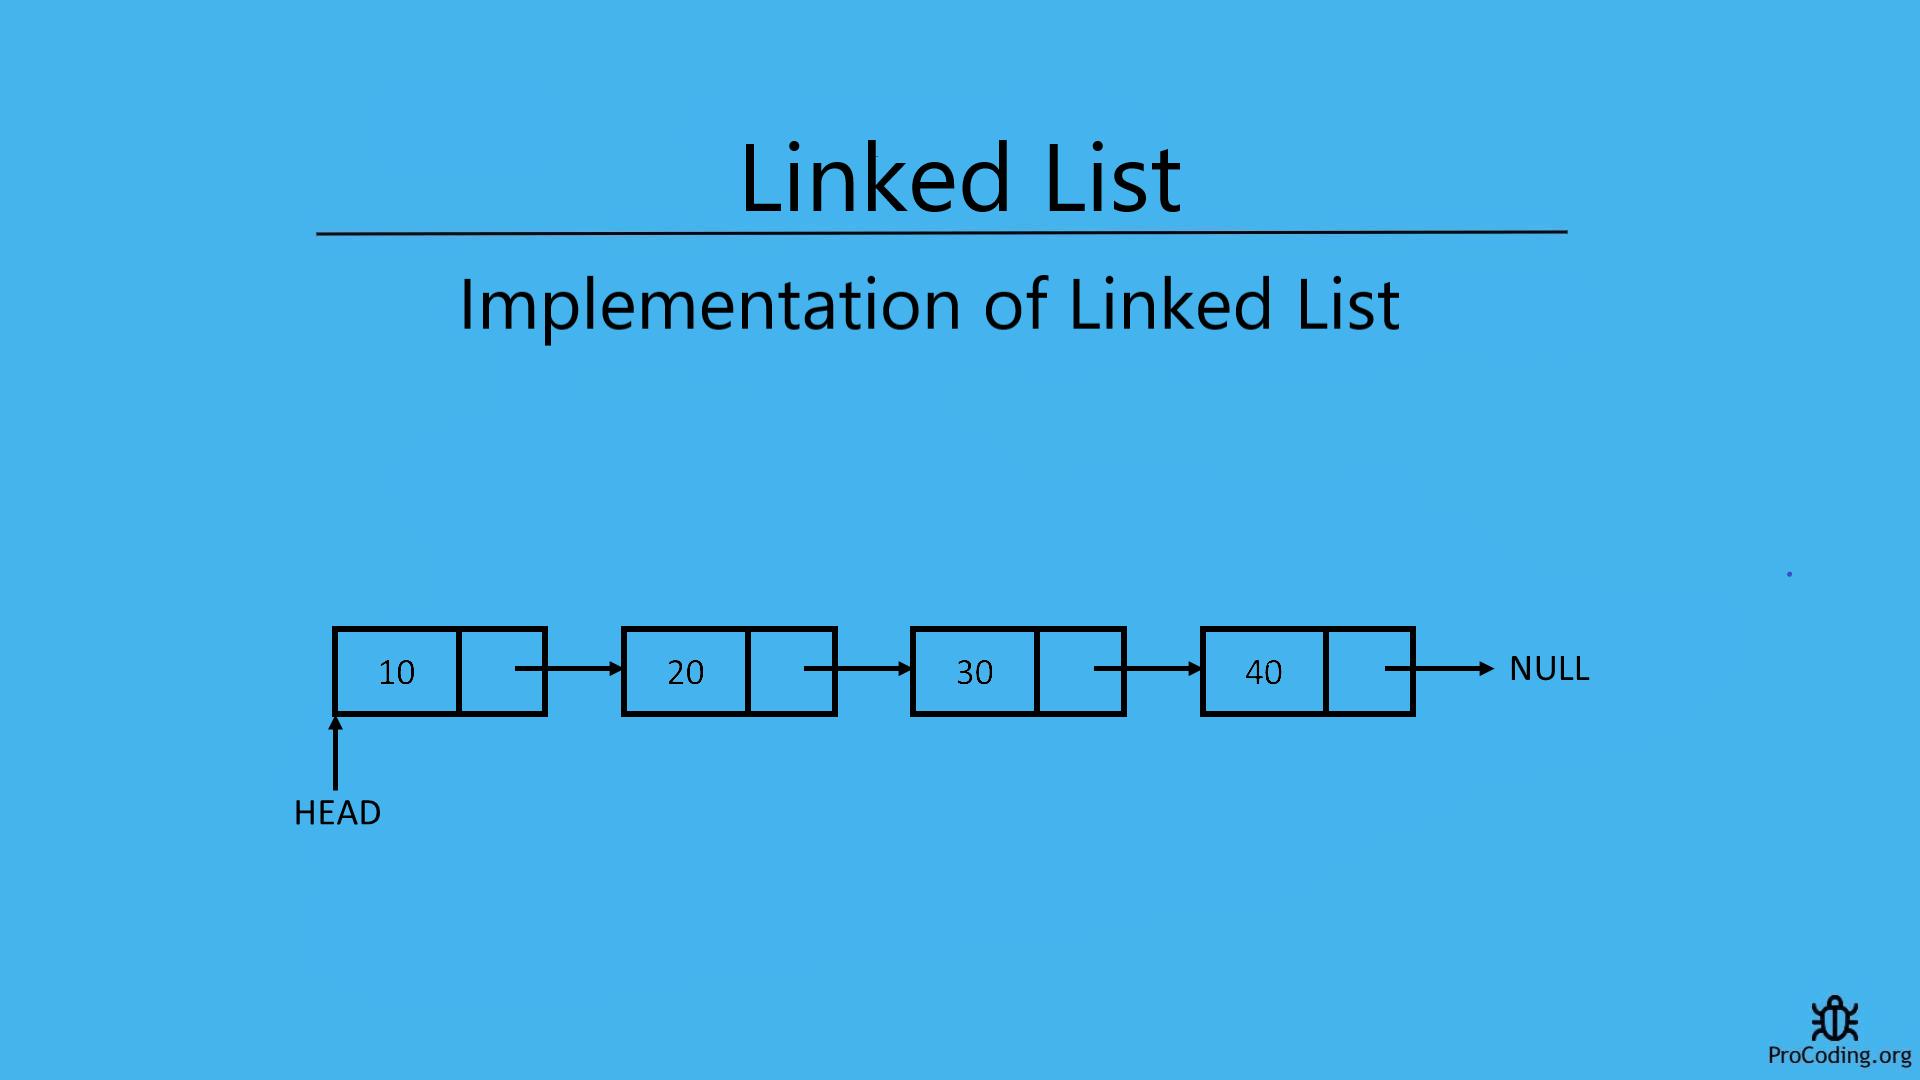 Implementation of Linked List (Singly Linked List)